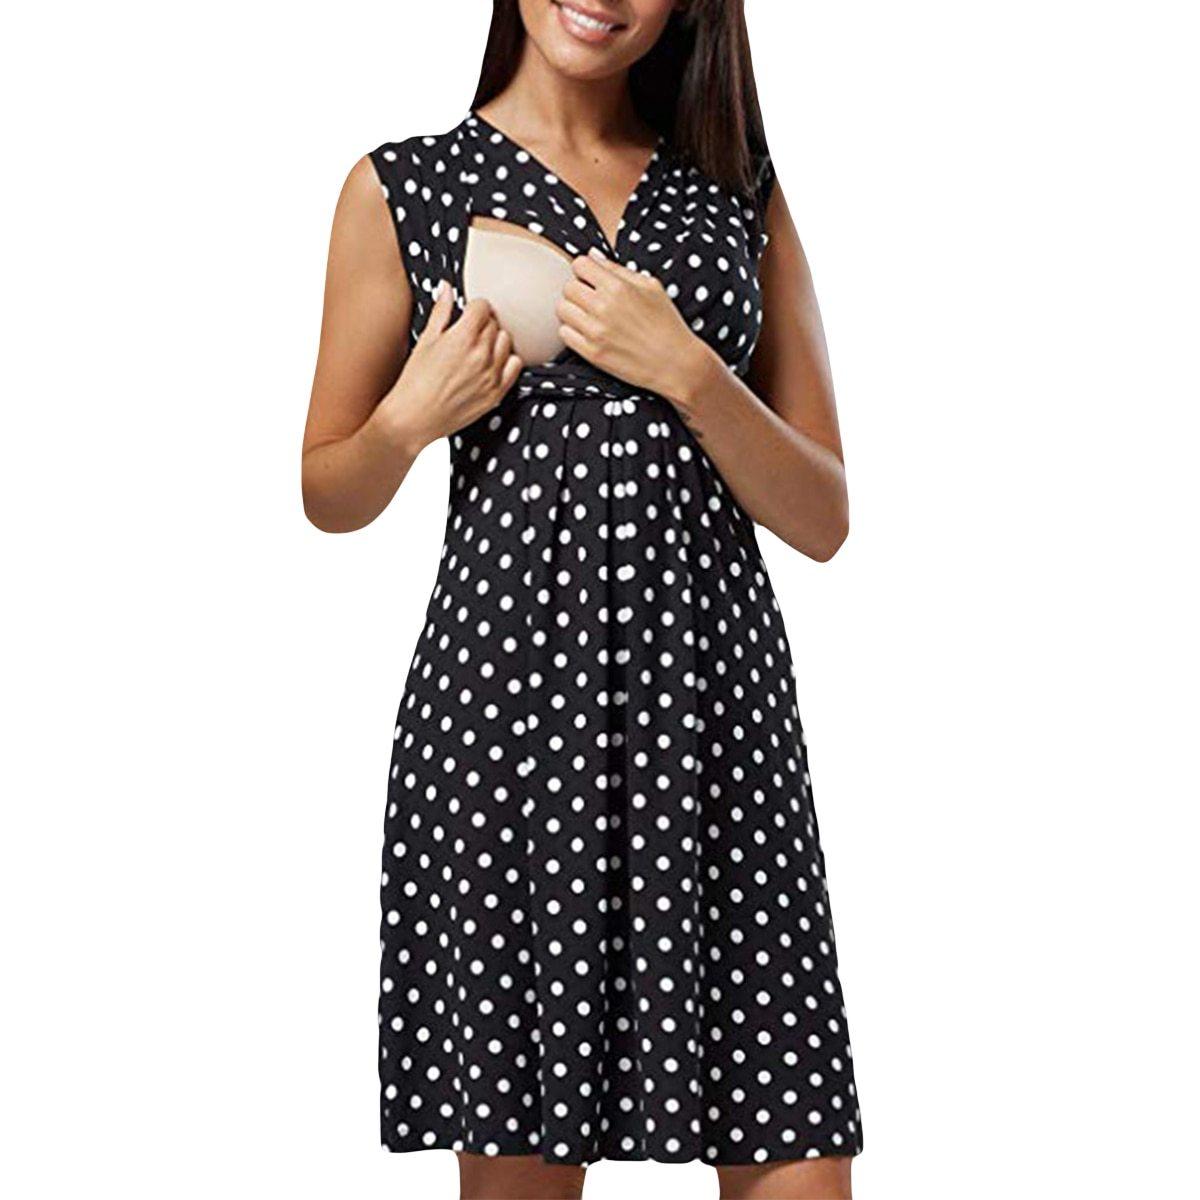 Maternity's Dress V Neck Dotted Print Sleeveless Fashion Dress